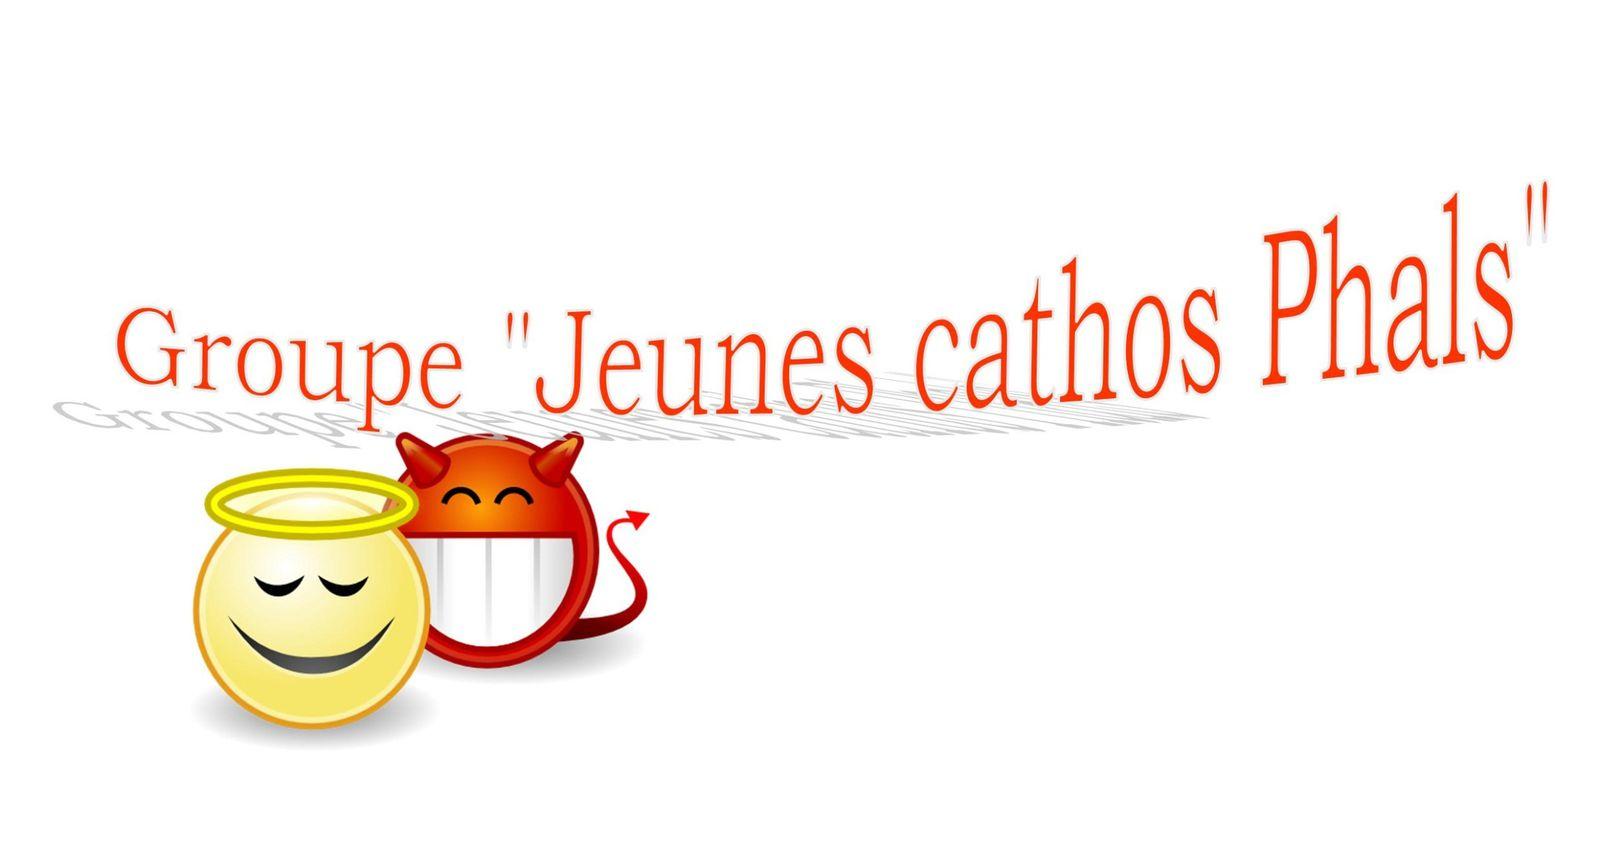 Site de rencontres cathos